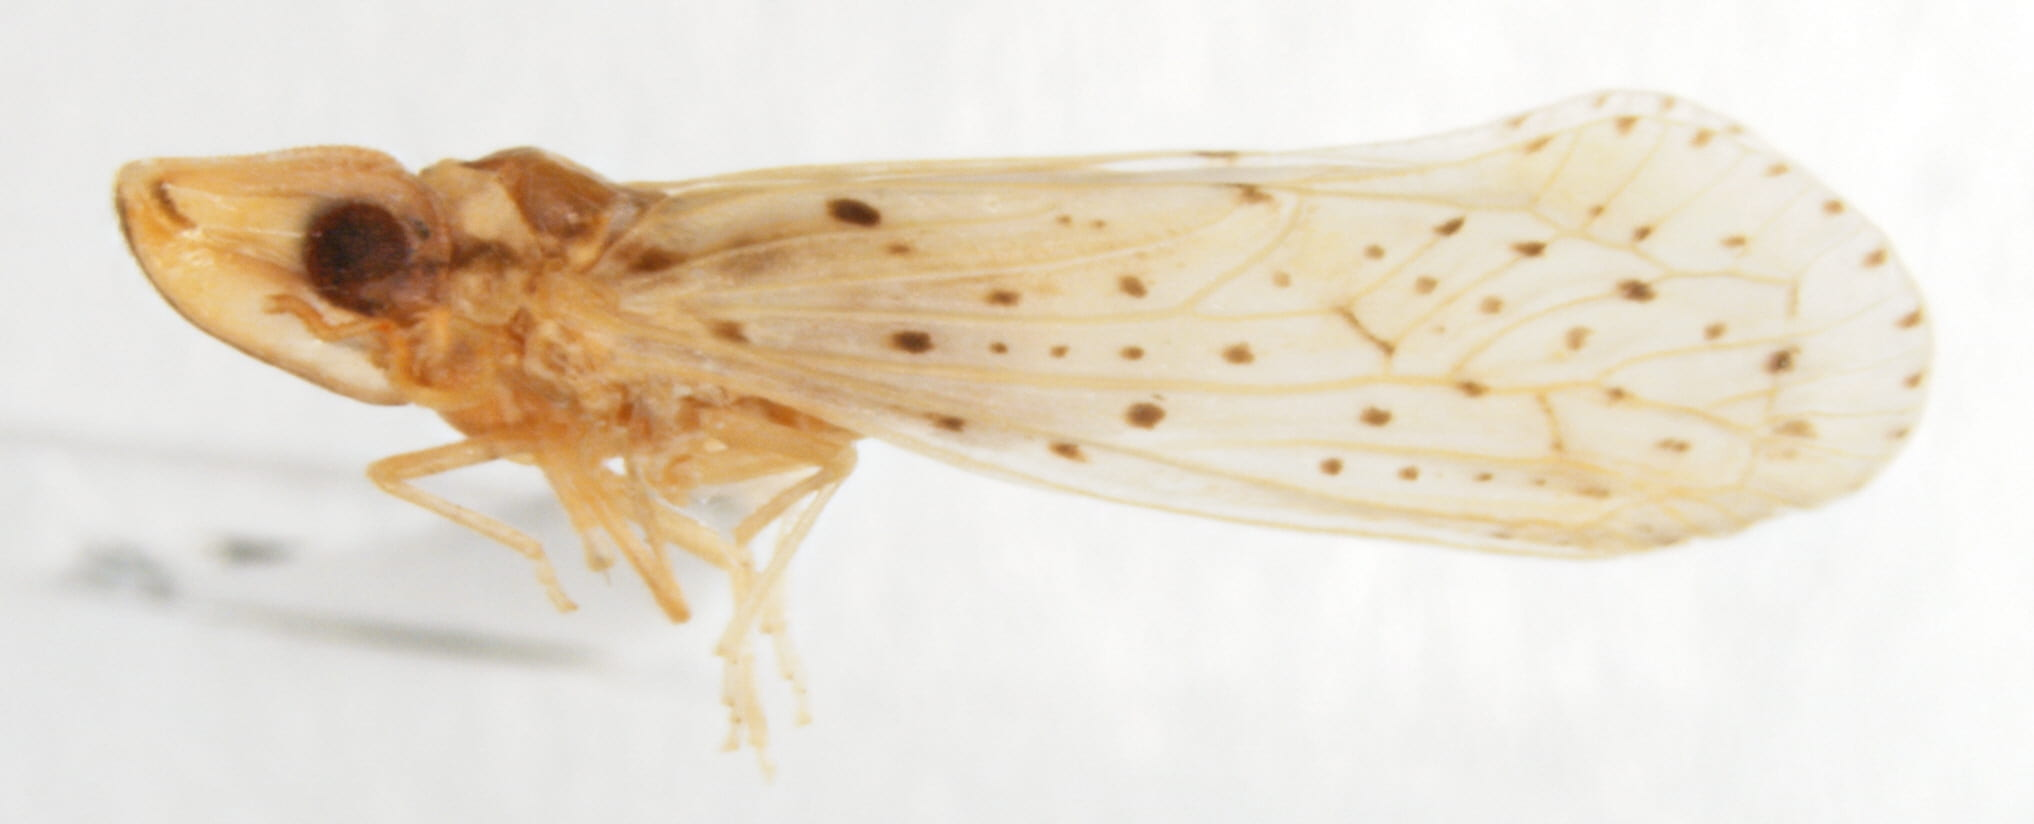 Otiocerus abbottii